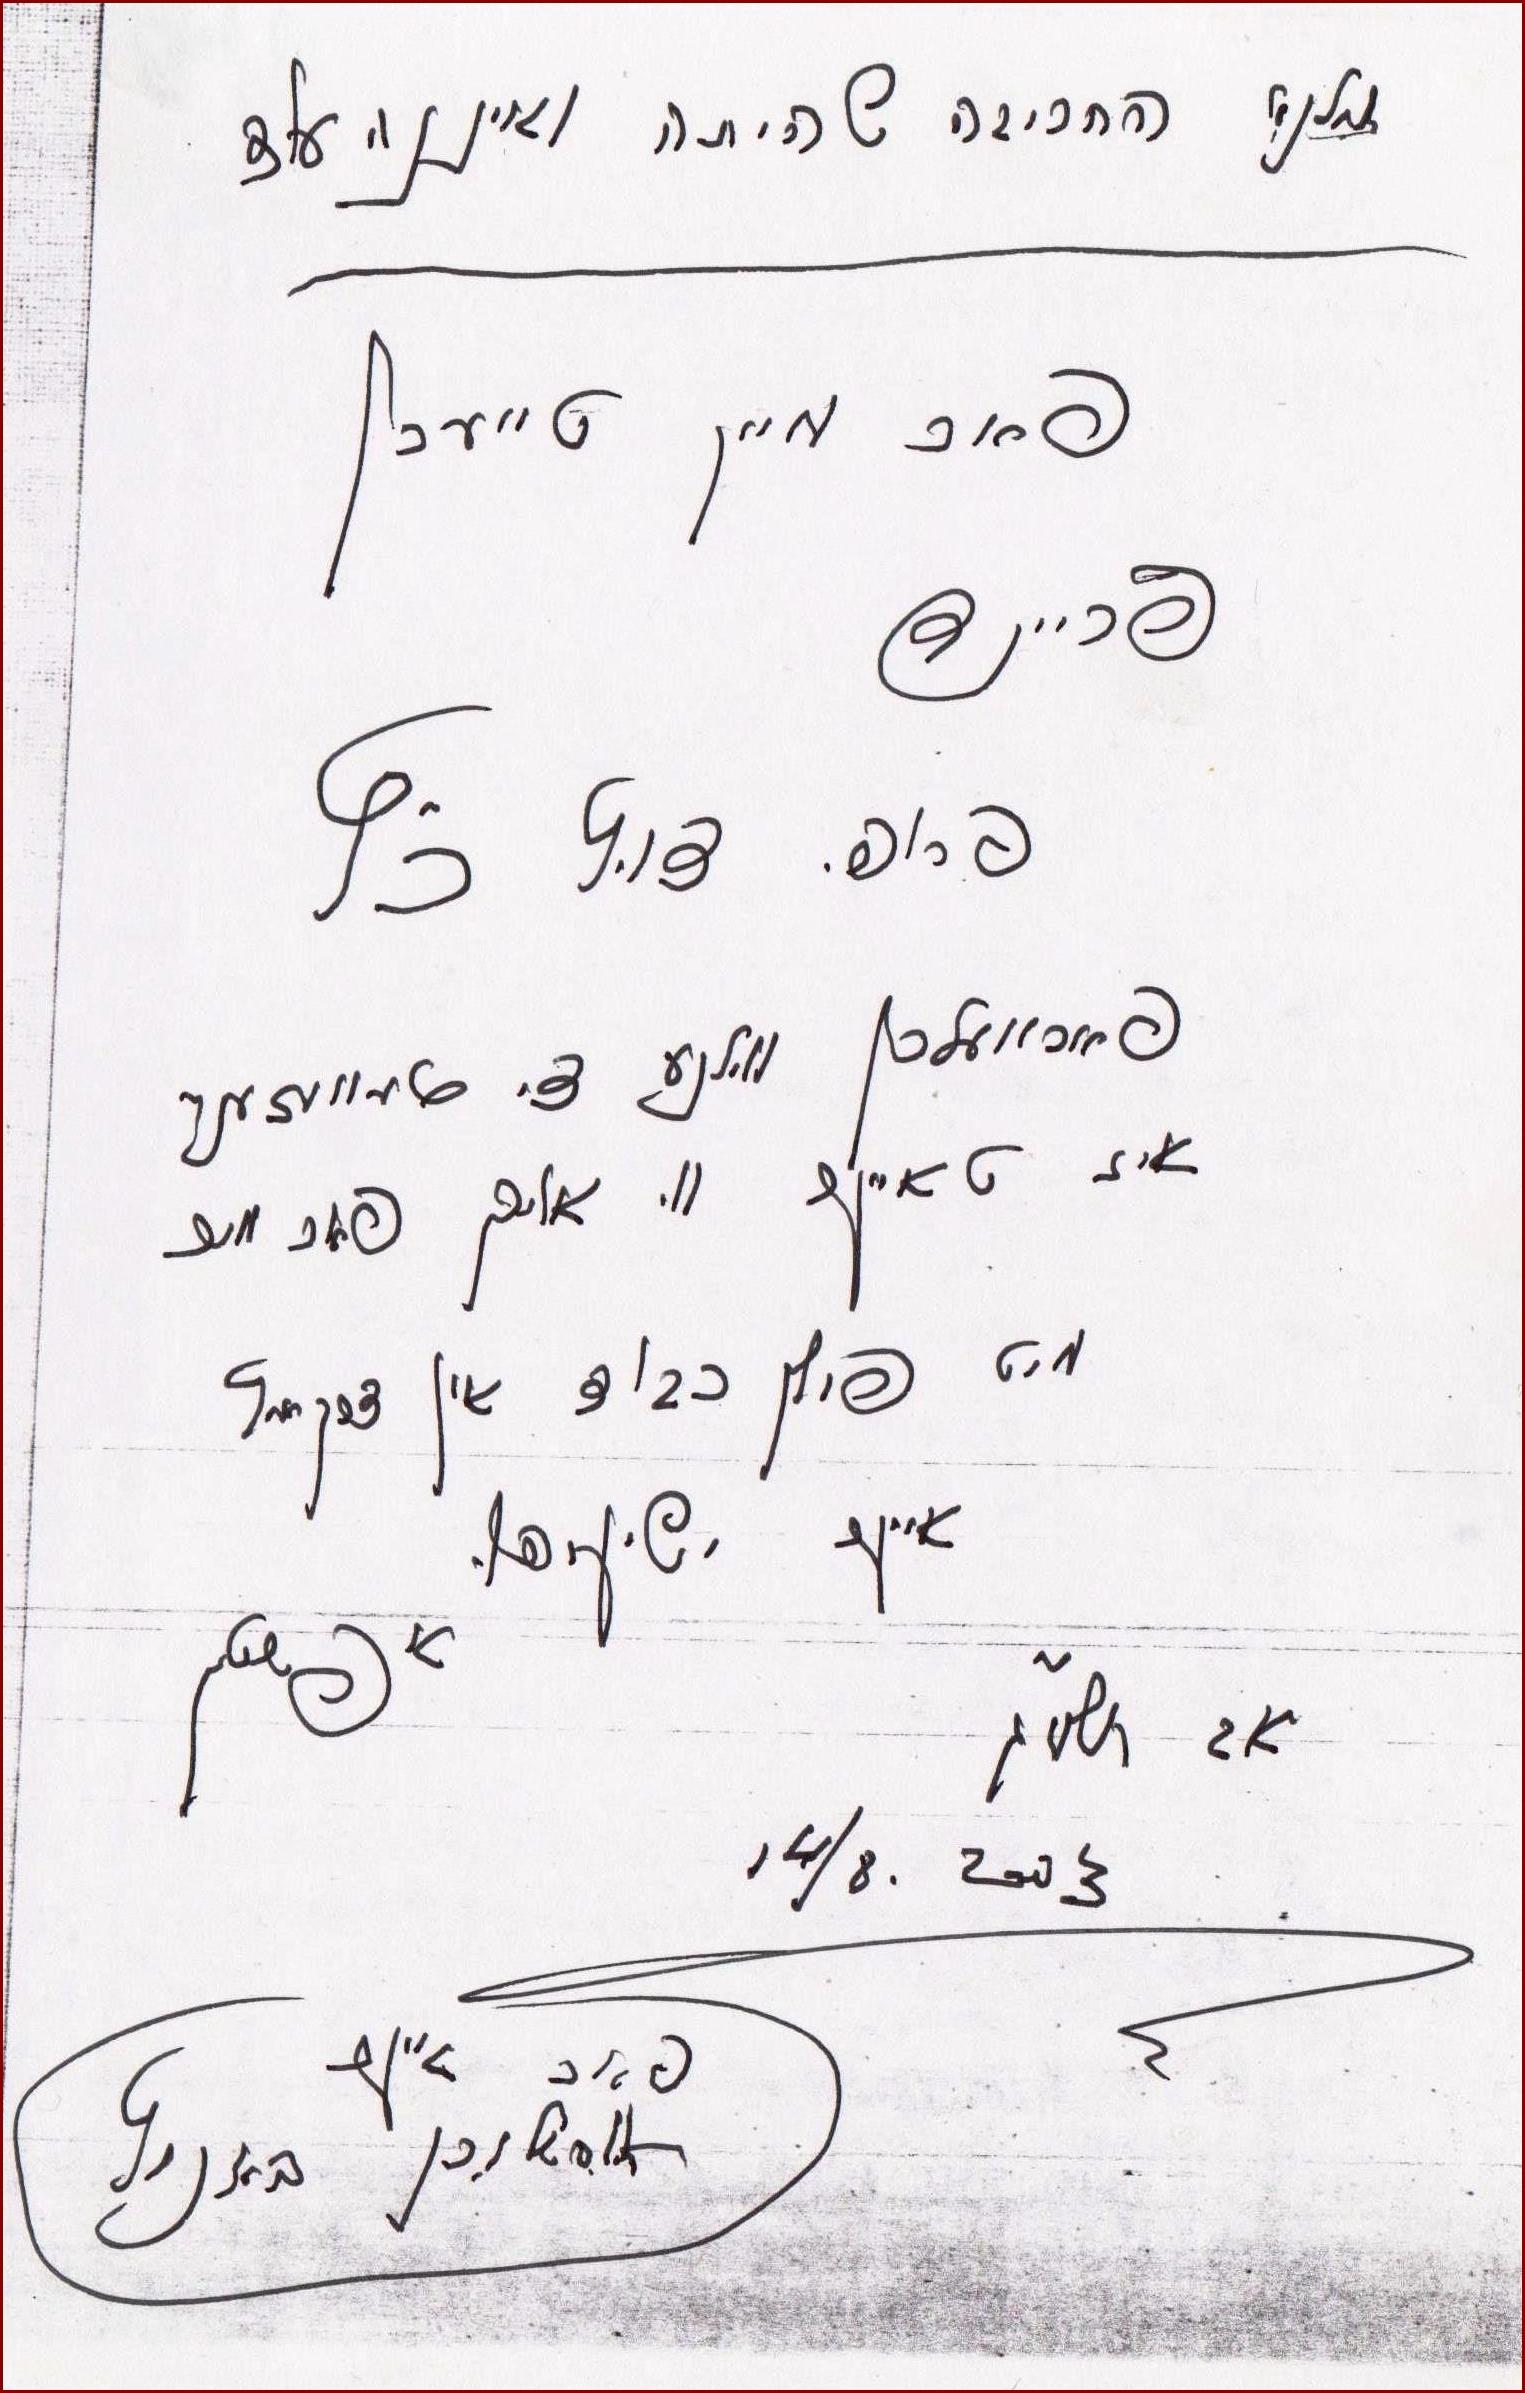 Yeshaye Epstein's dedication on Shik's book - Copy